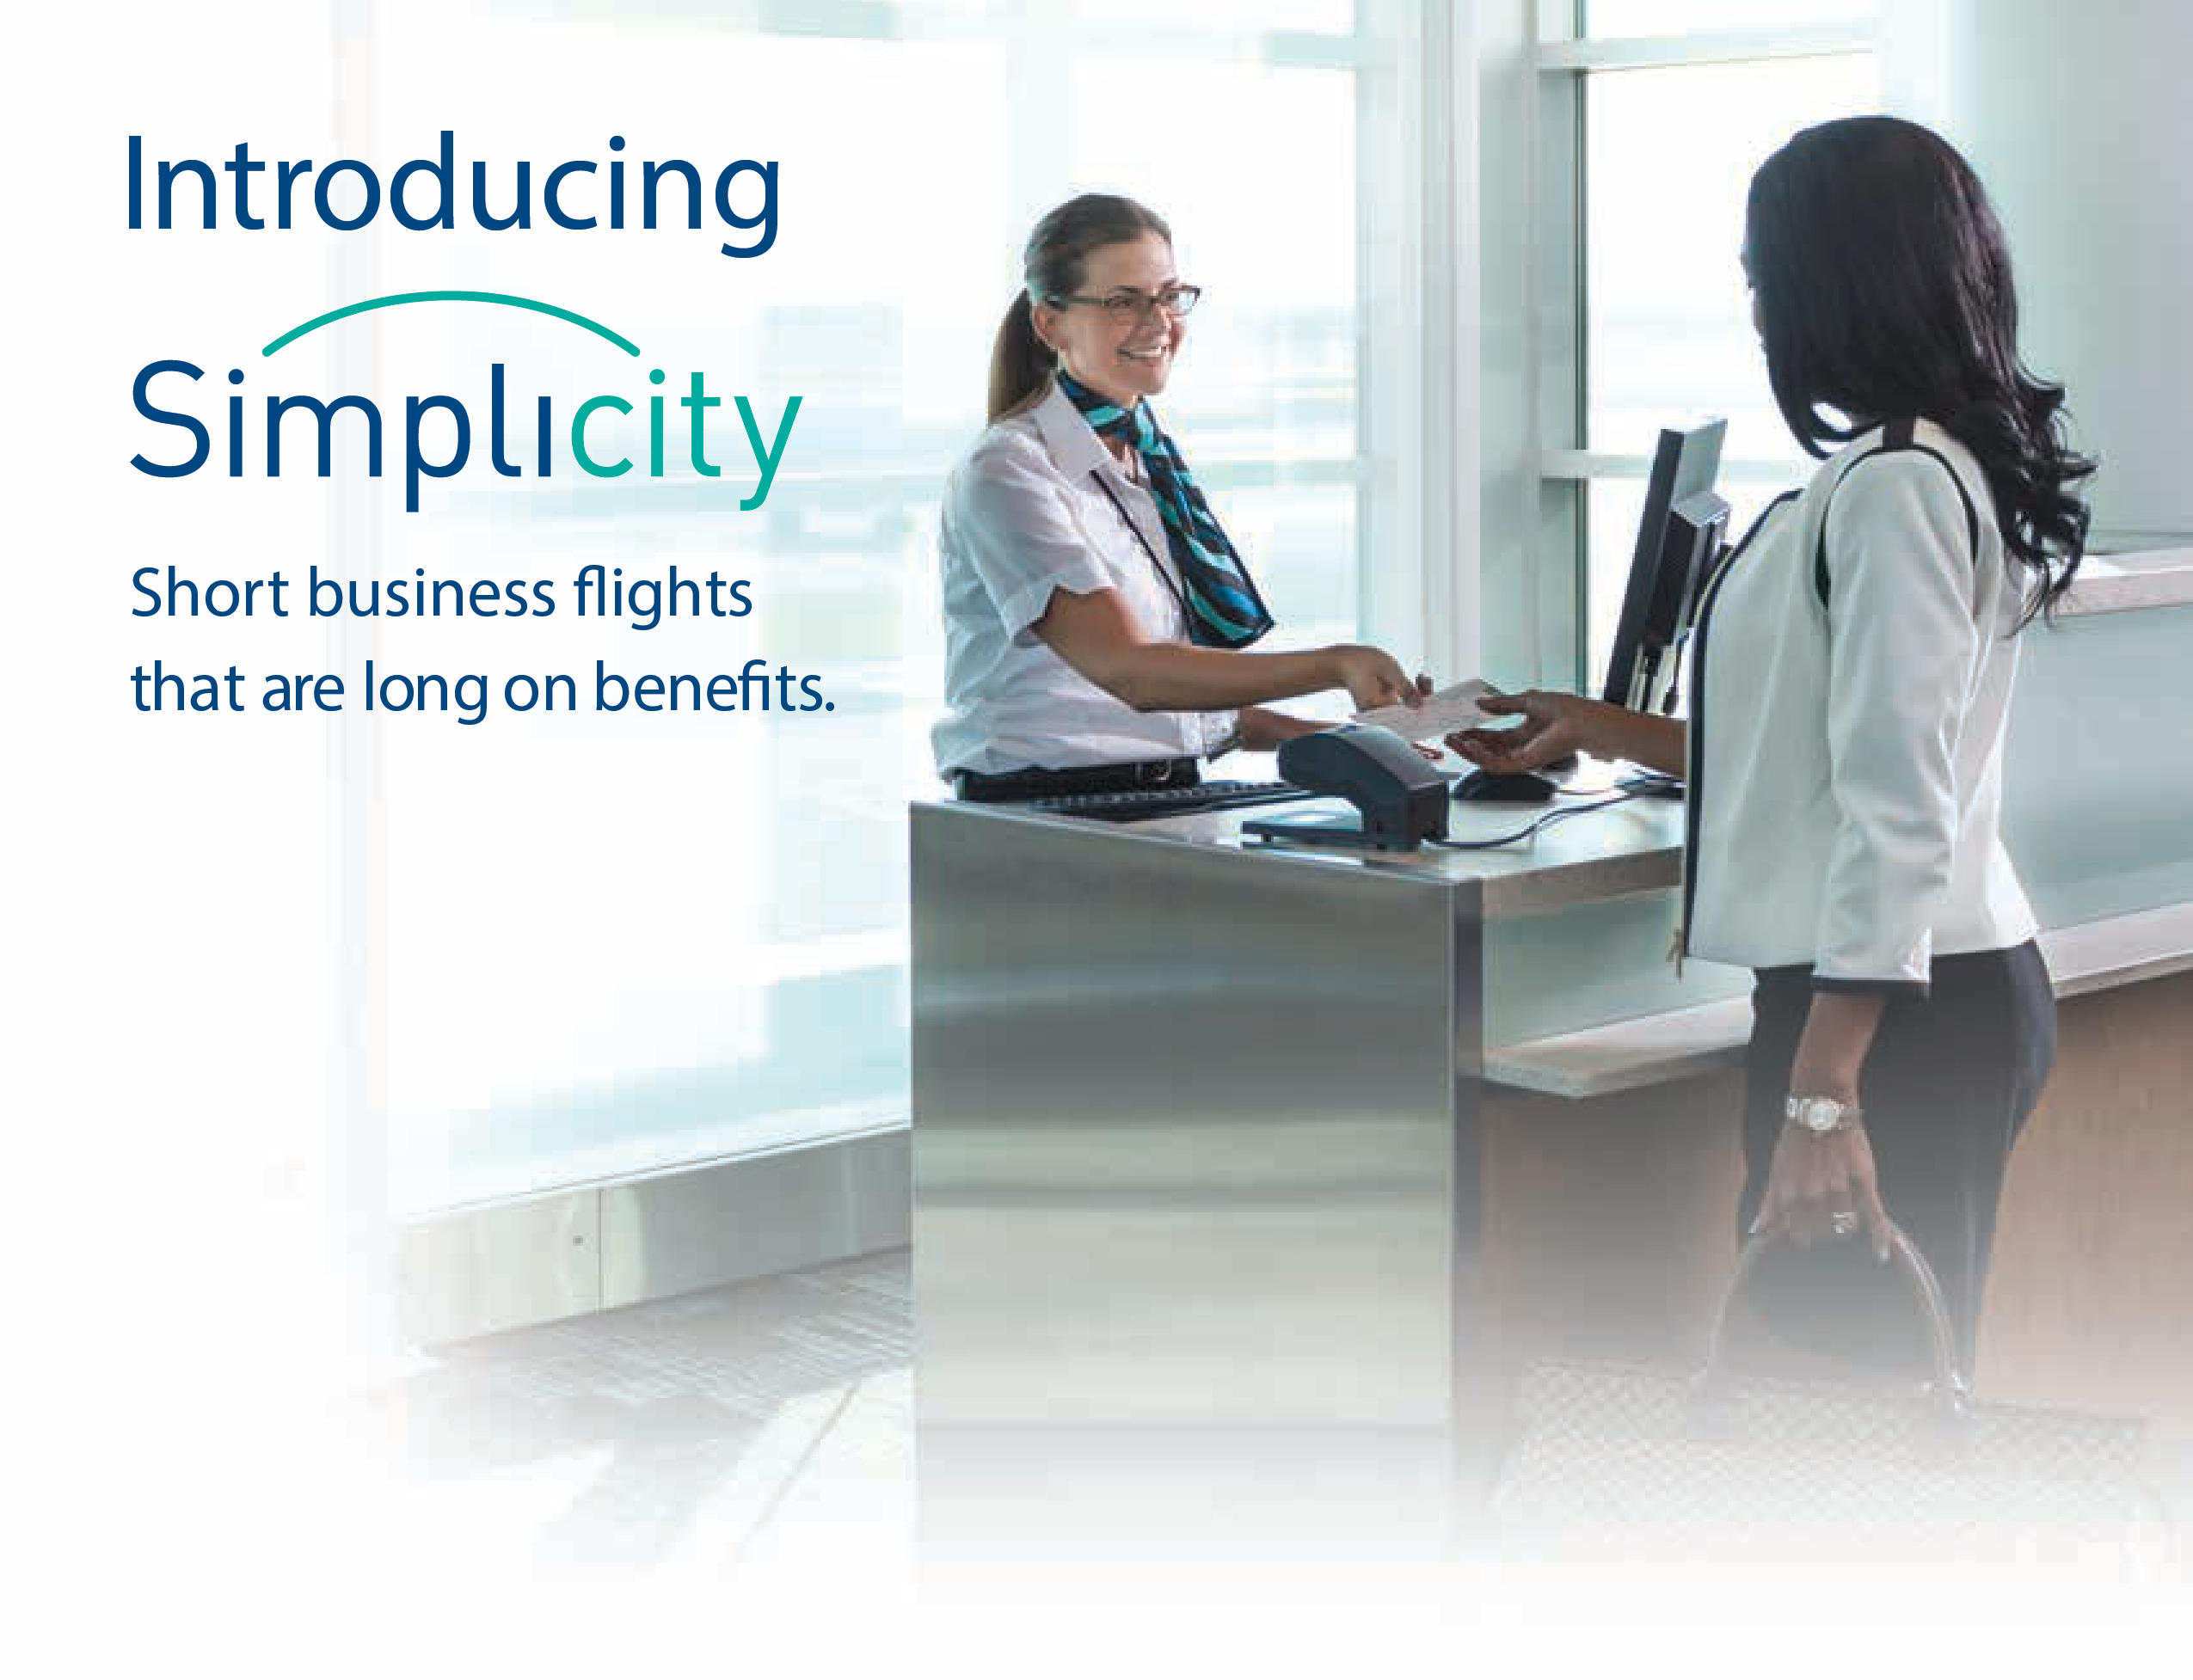 Introducing WestJet's Simplicity Program